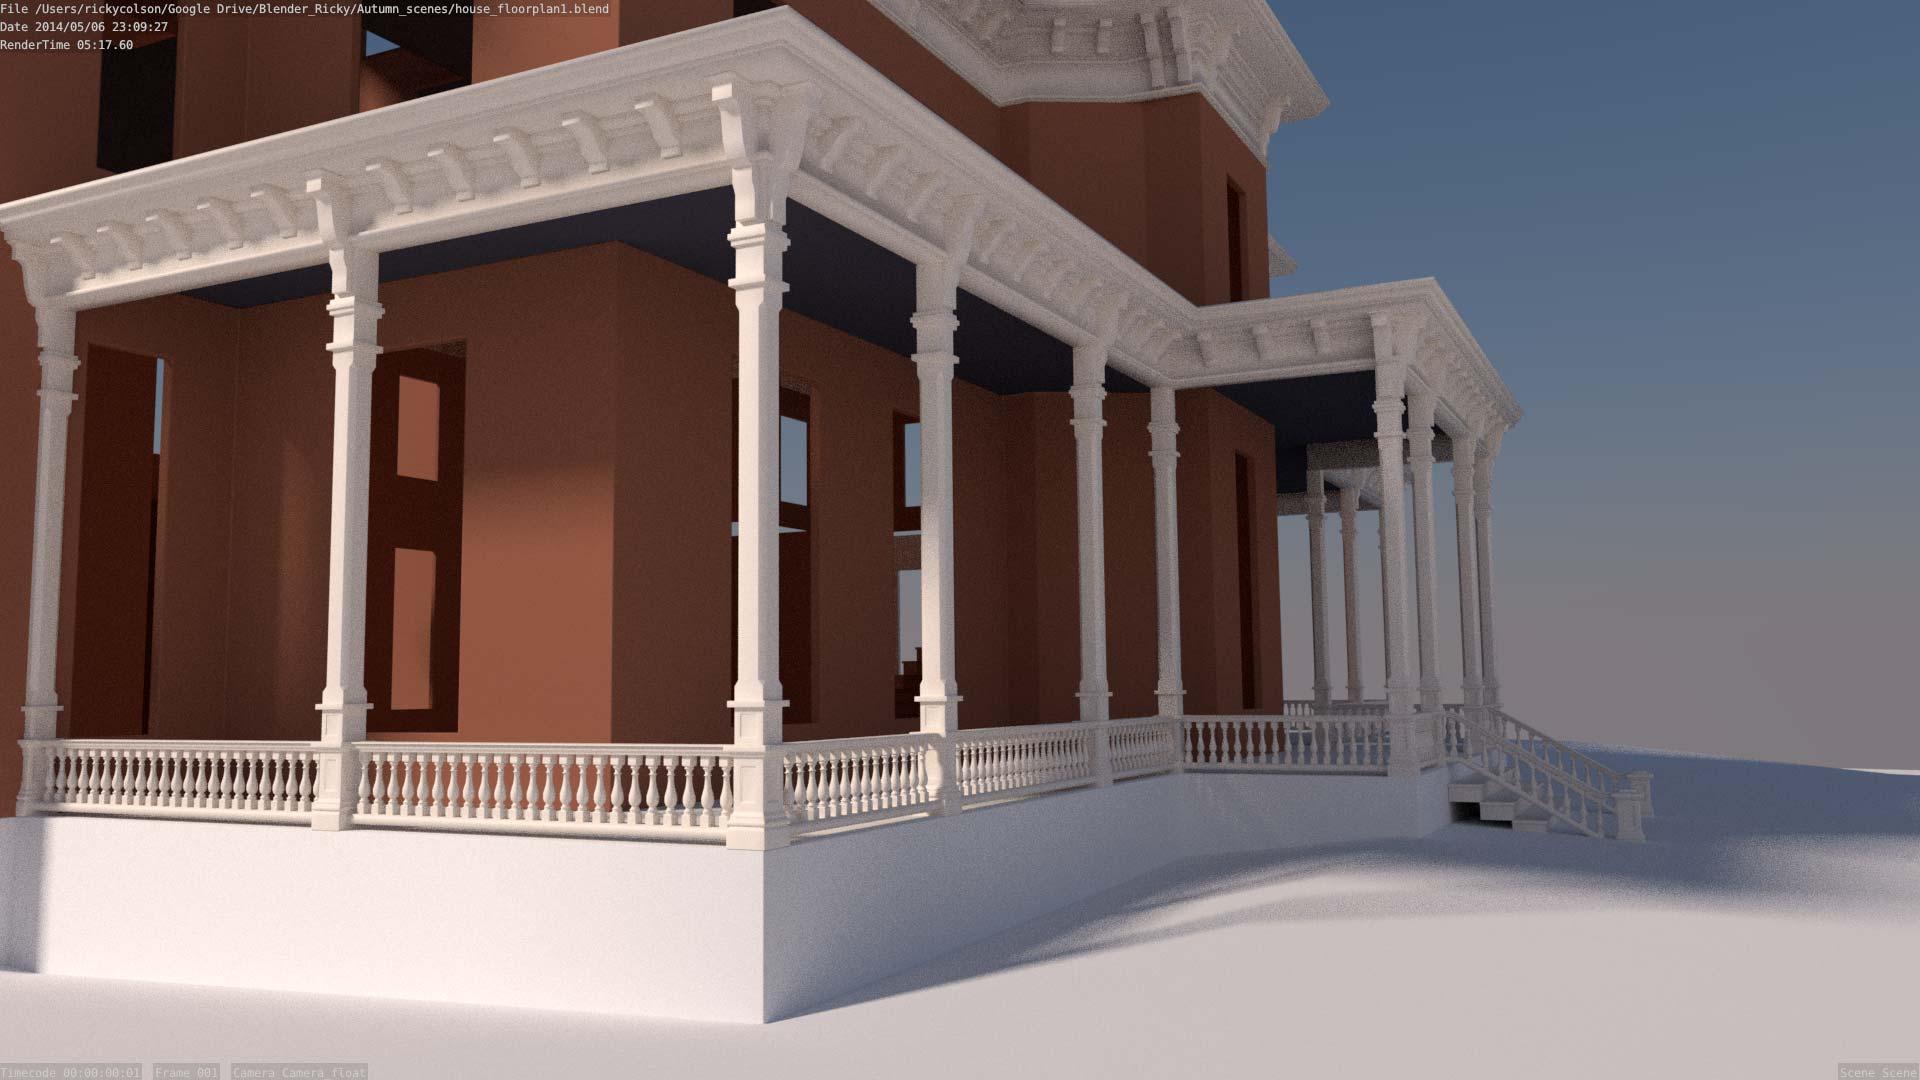 back porch of 3d house model